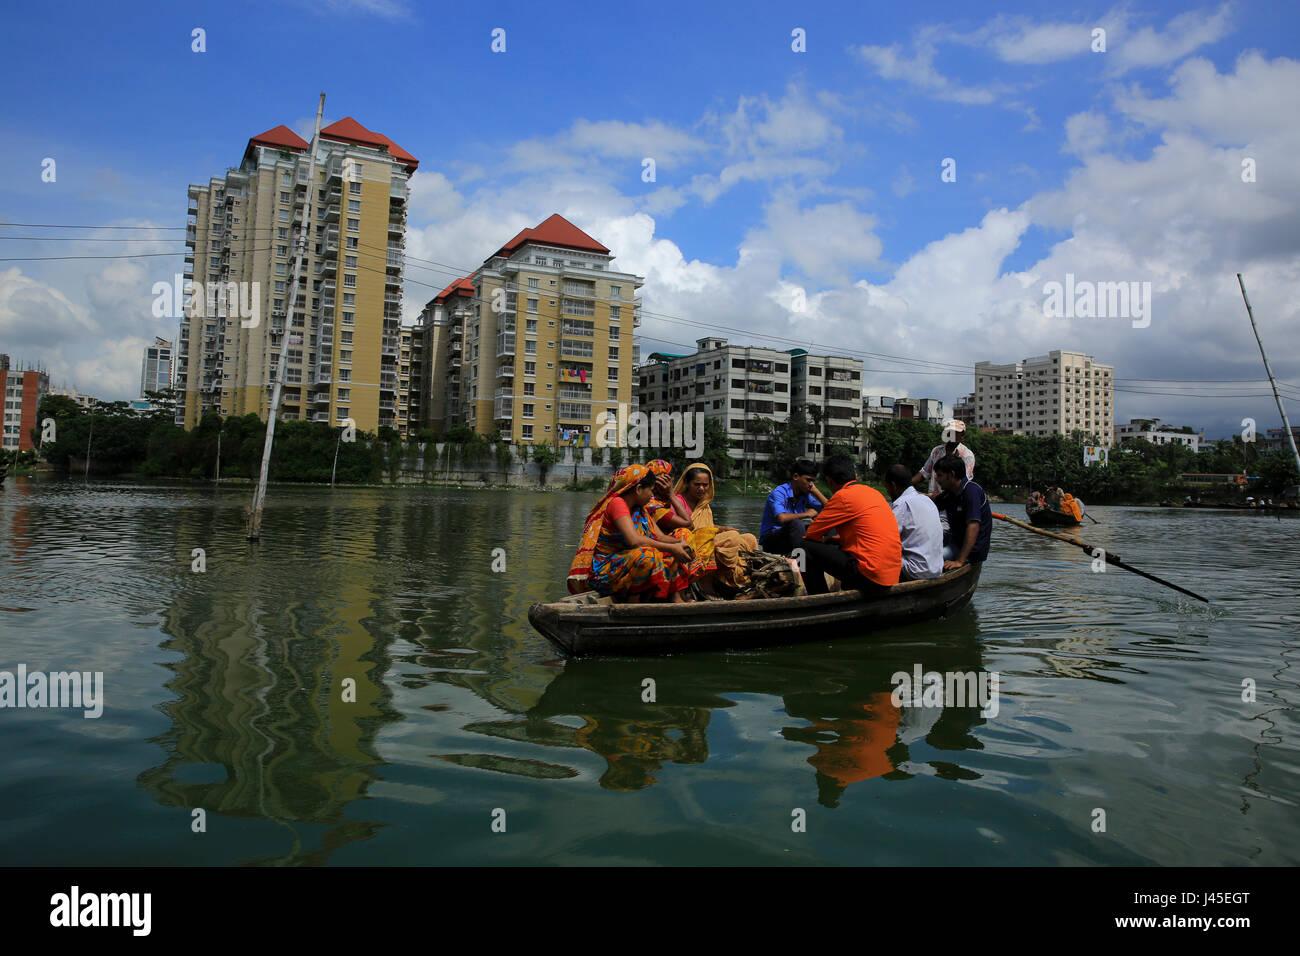 Dwellers of Korail Slum cross the Gulshan Lake. Dhaka, Bangladesh  - Stock Image